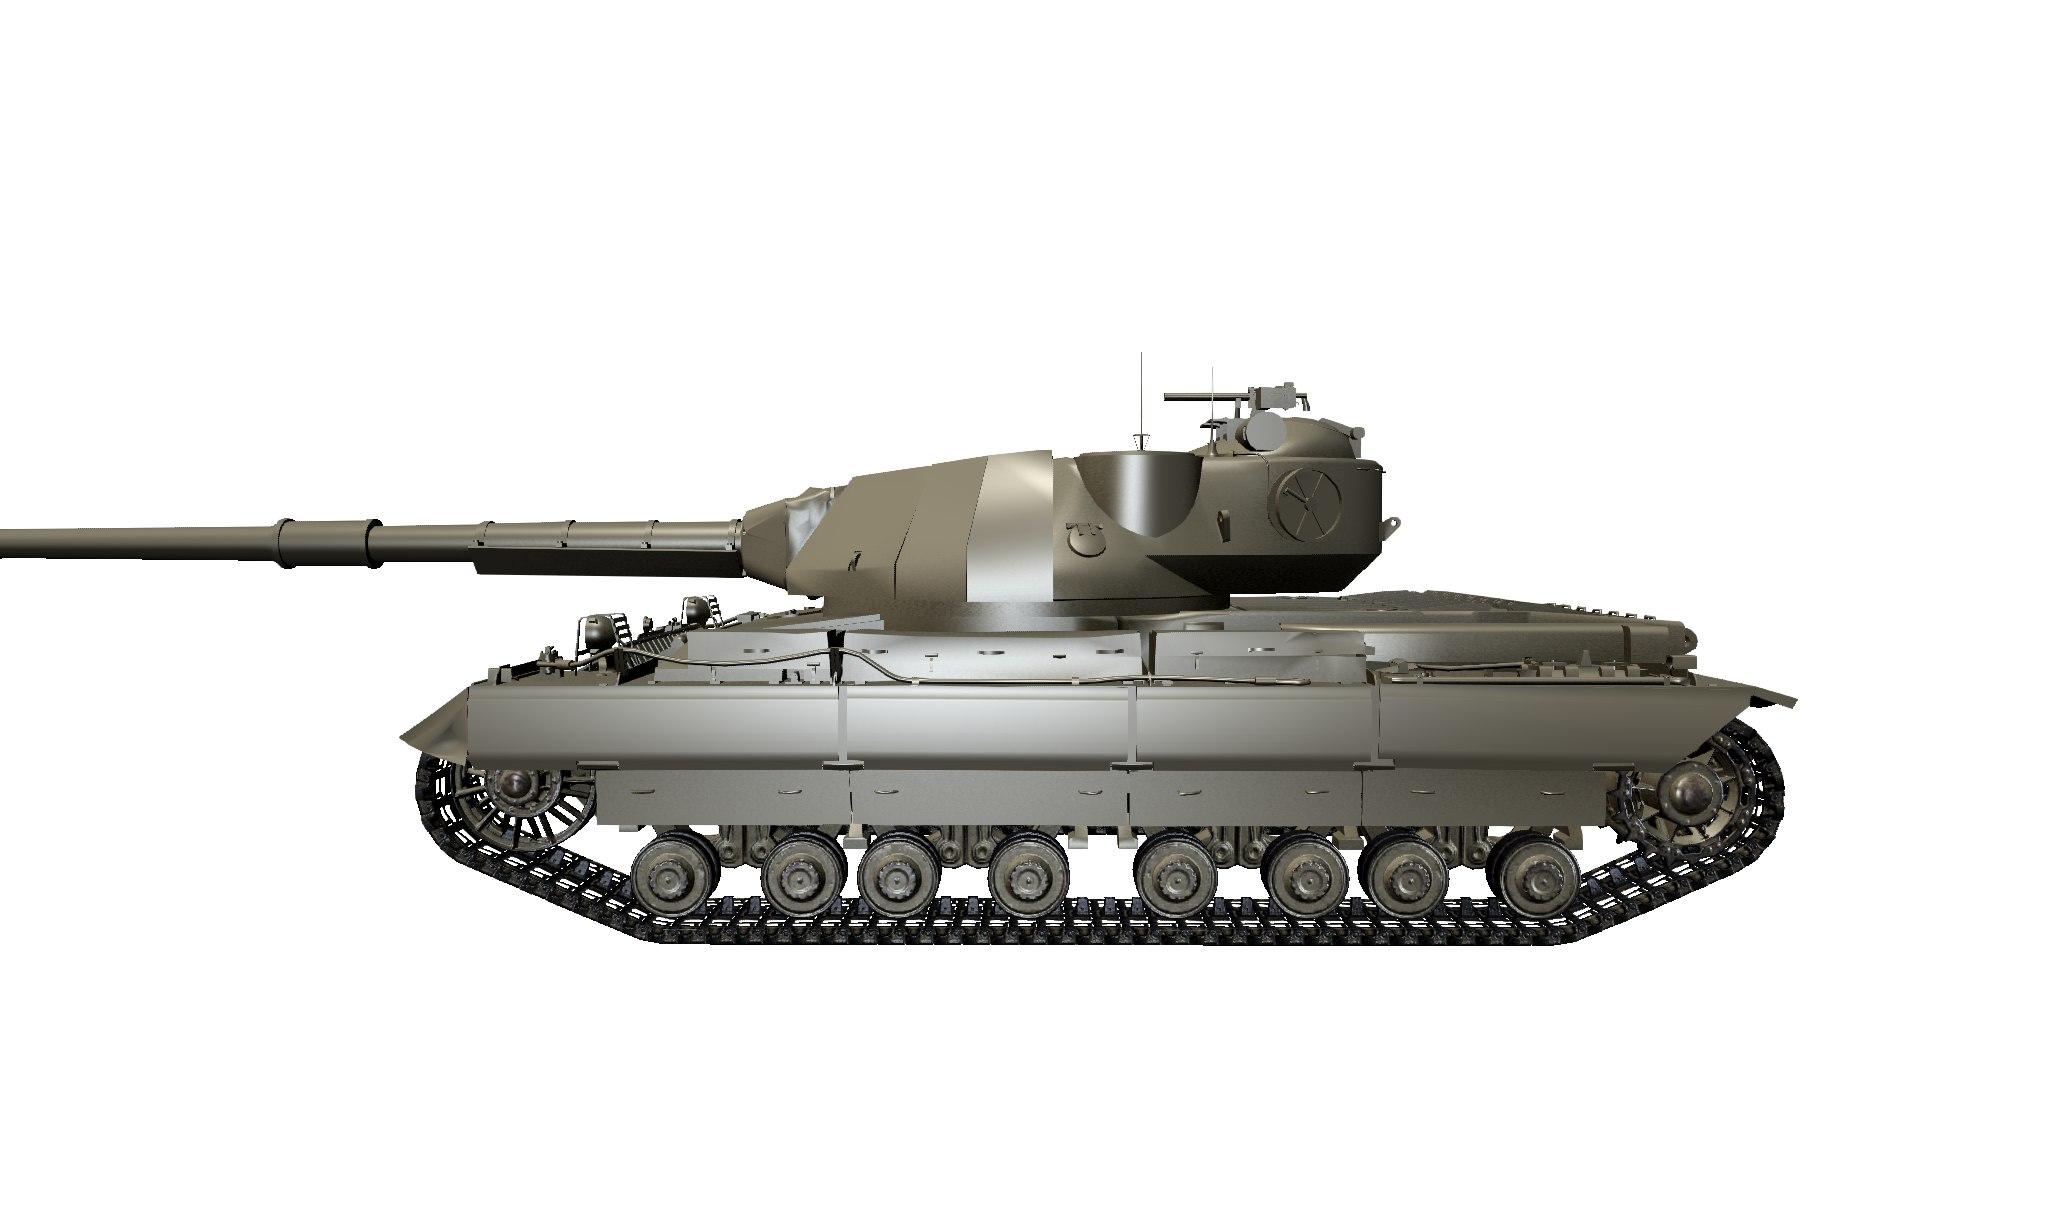 World of Tanks Supertest - Super Conqueror stats and pics ...